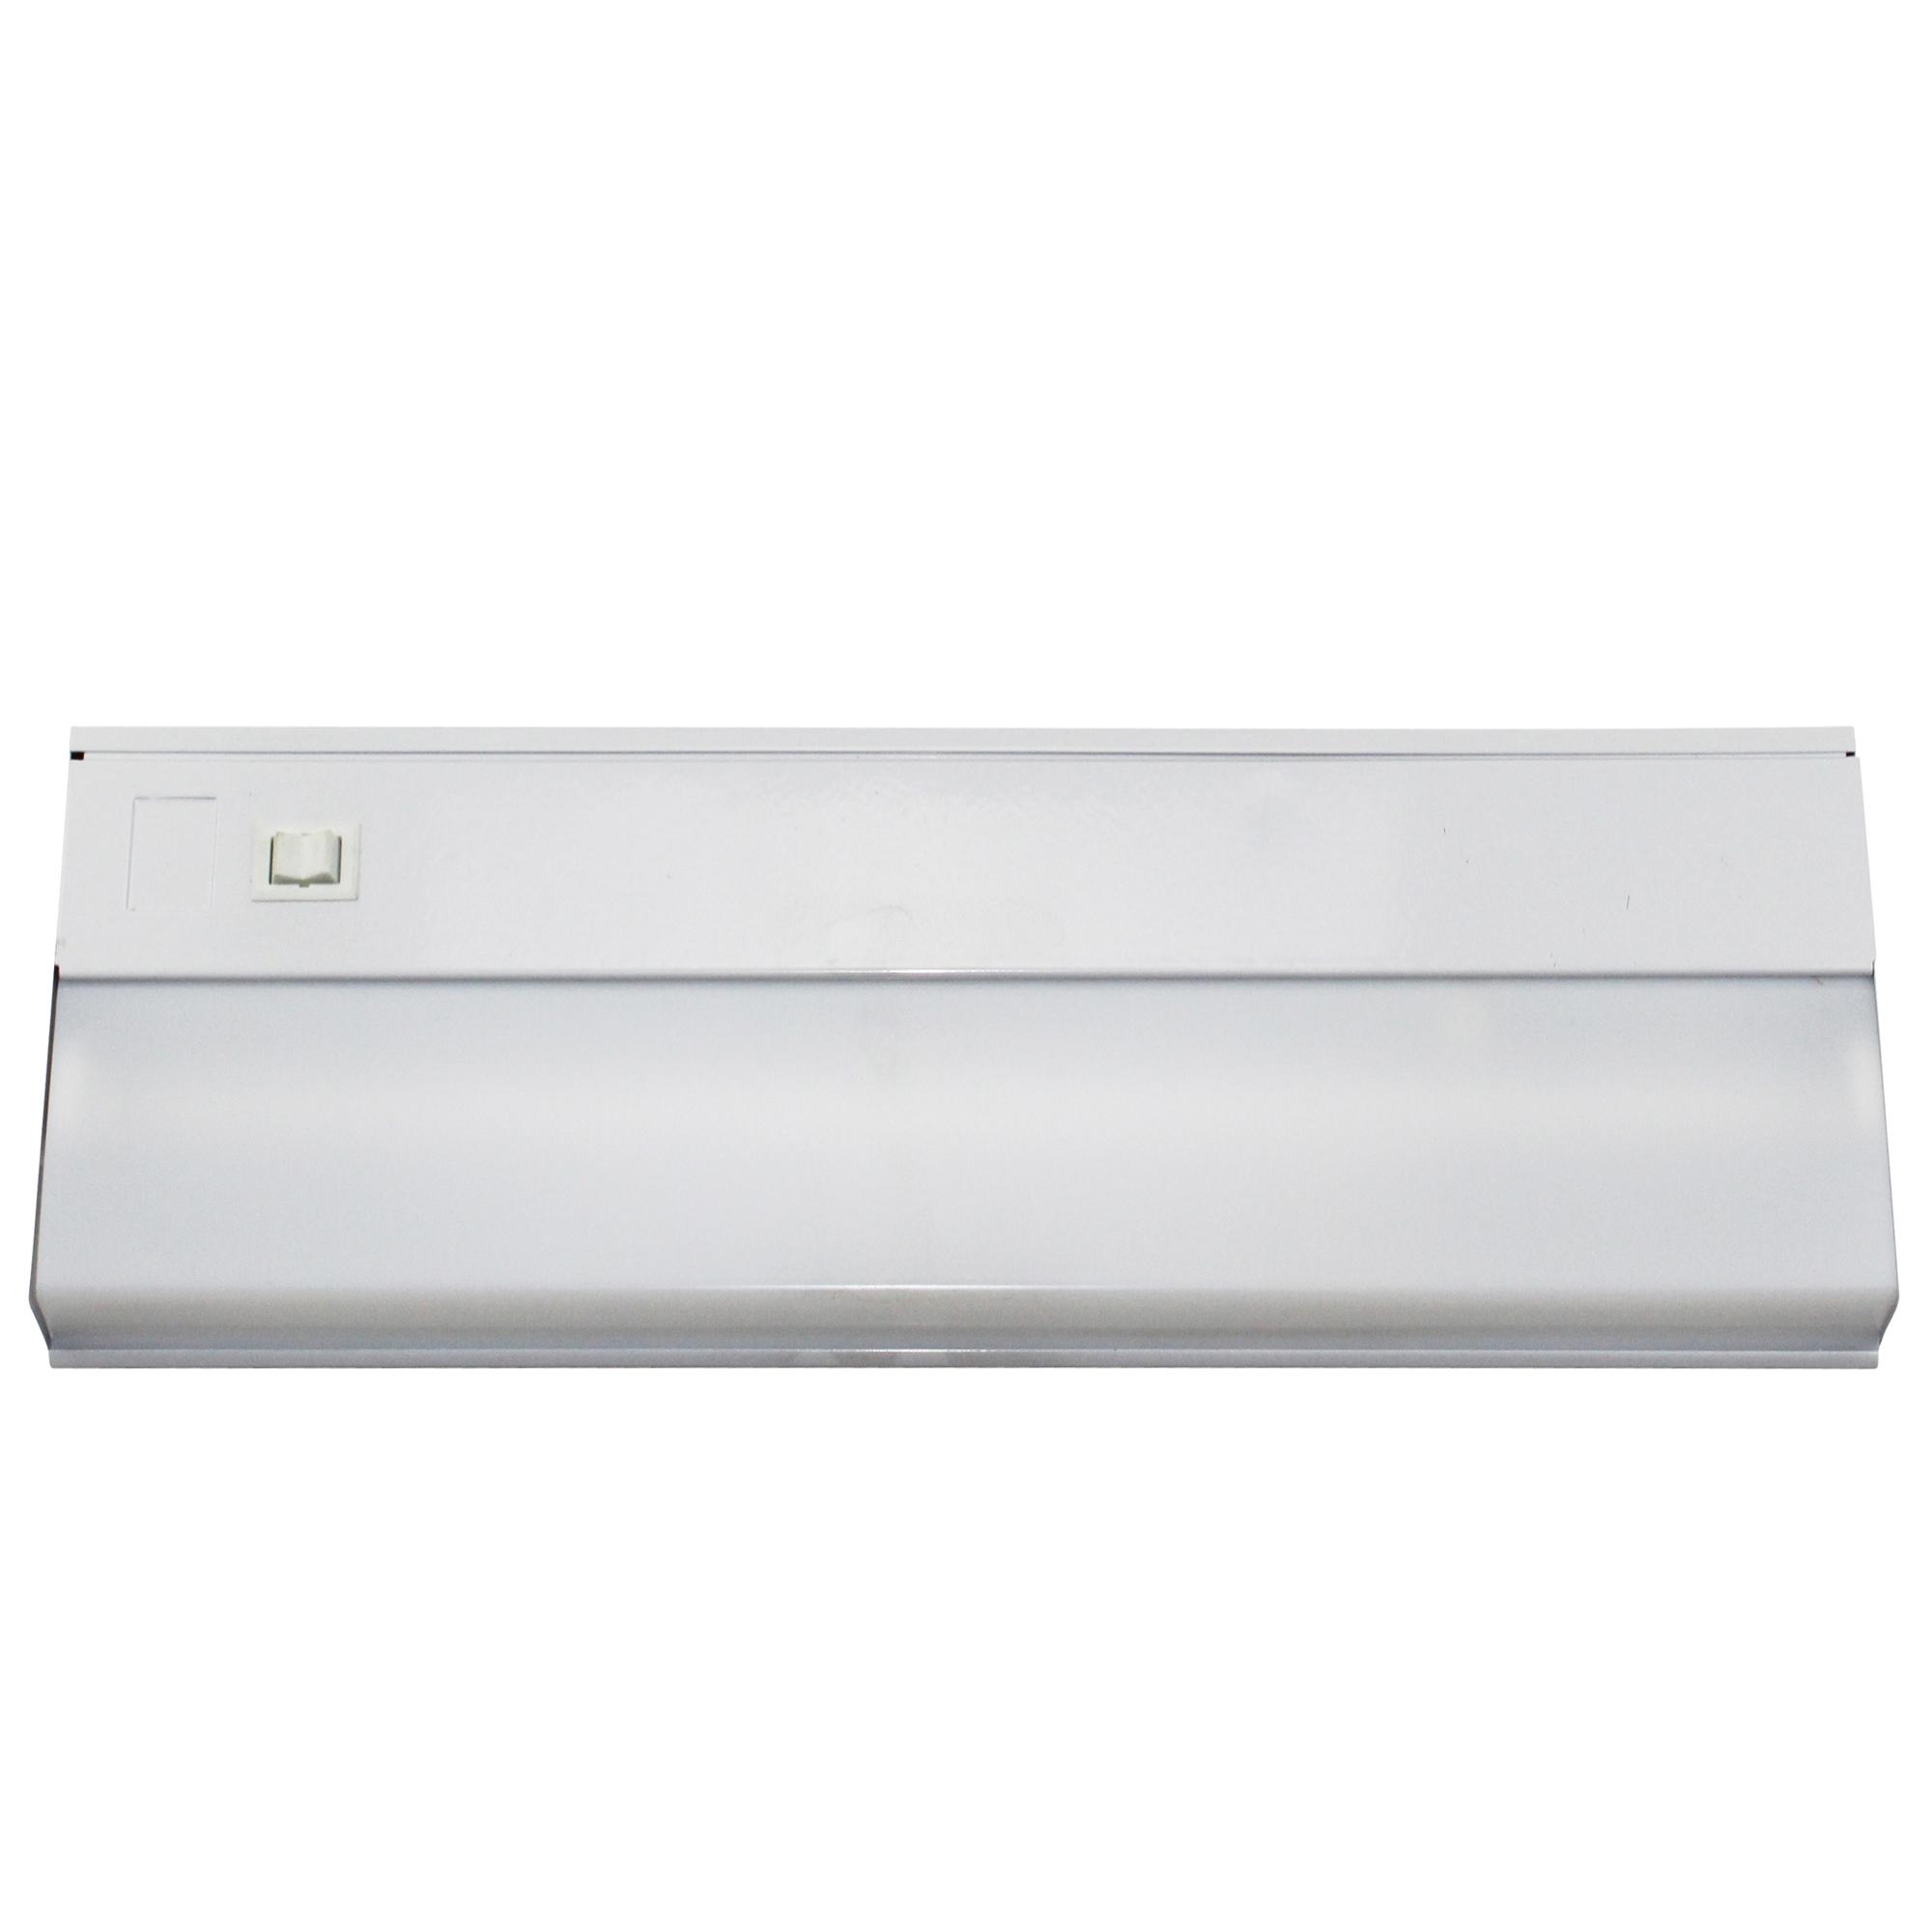 24 Inch Light Fixture Ge 16687 24 Inch Premium